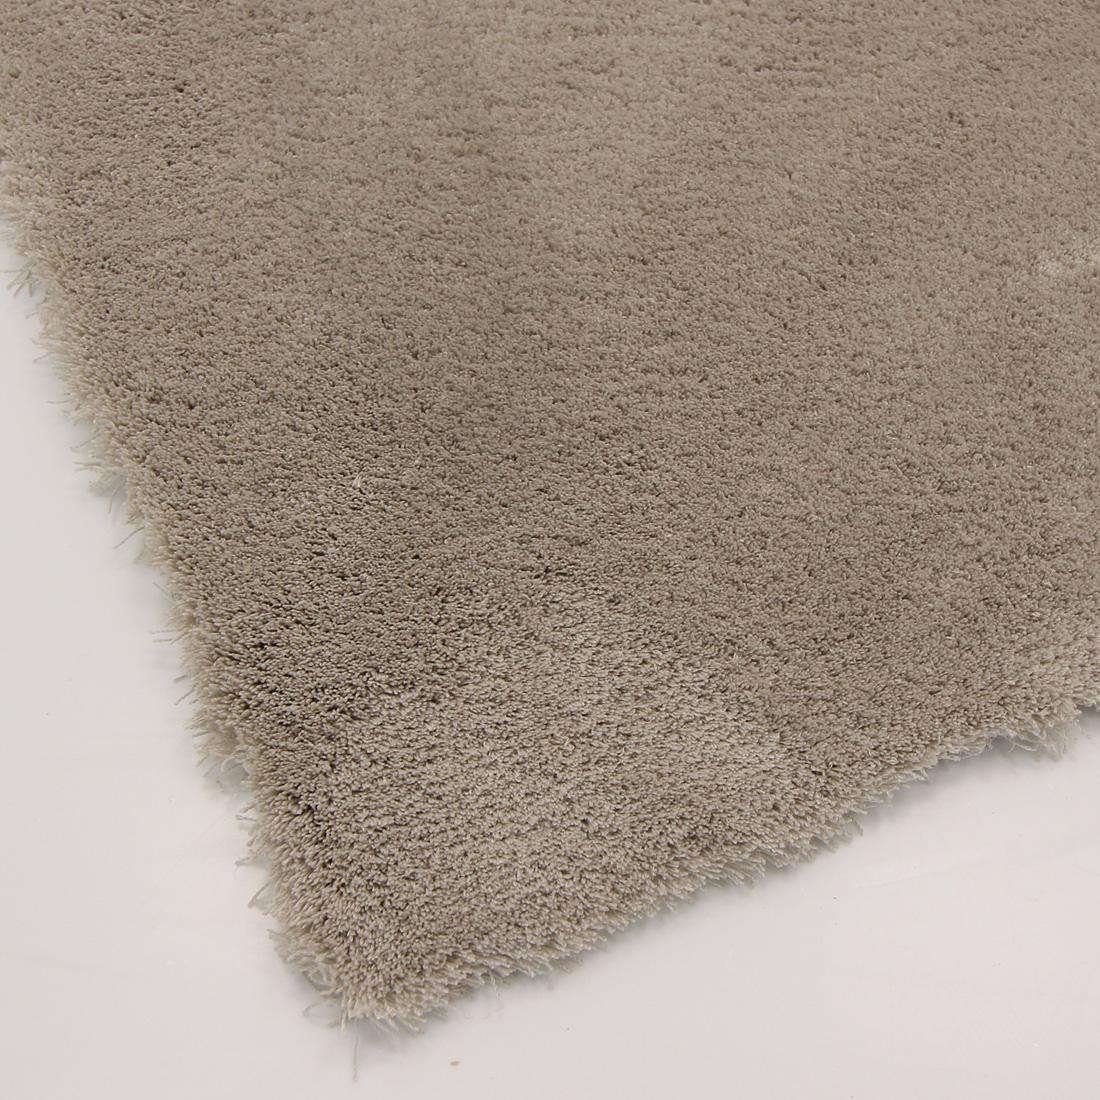 Vloerkleed Xilento Silky Soft Stone | 200 x 300 cm